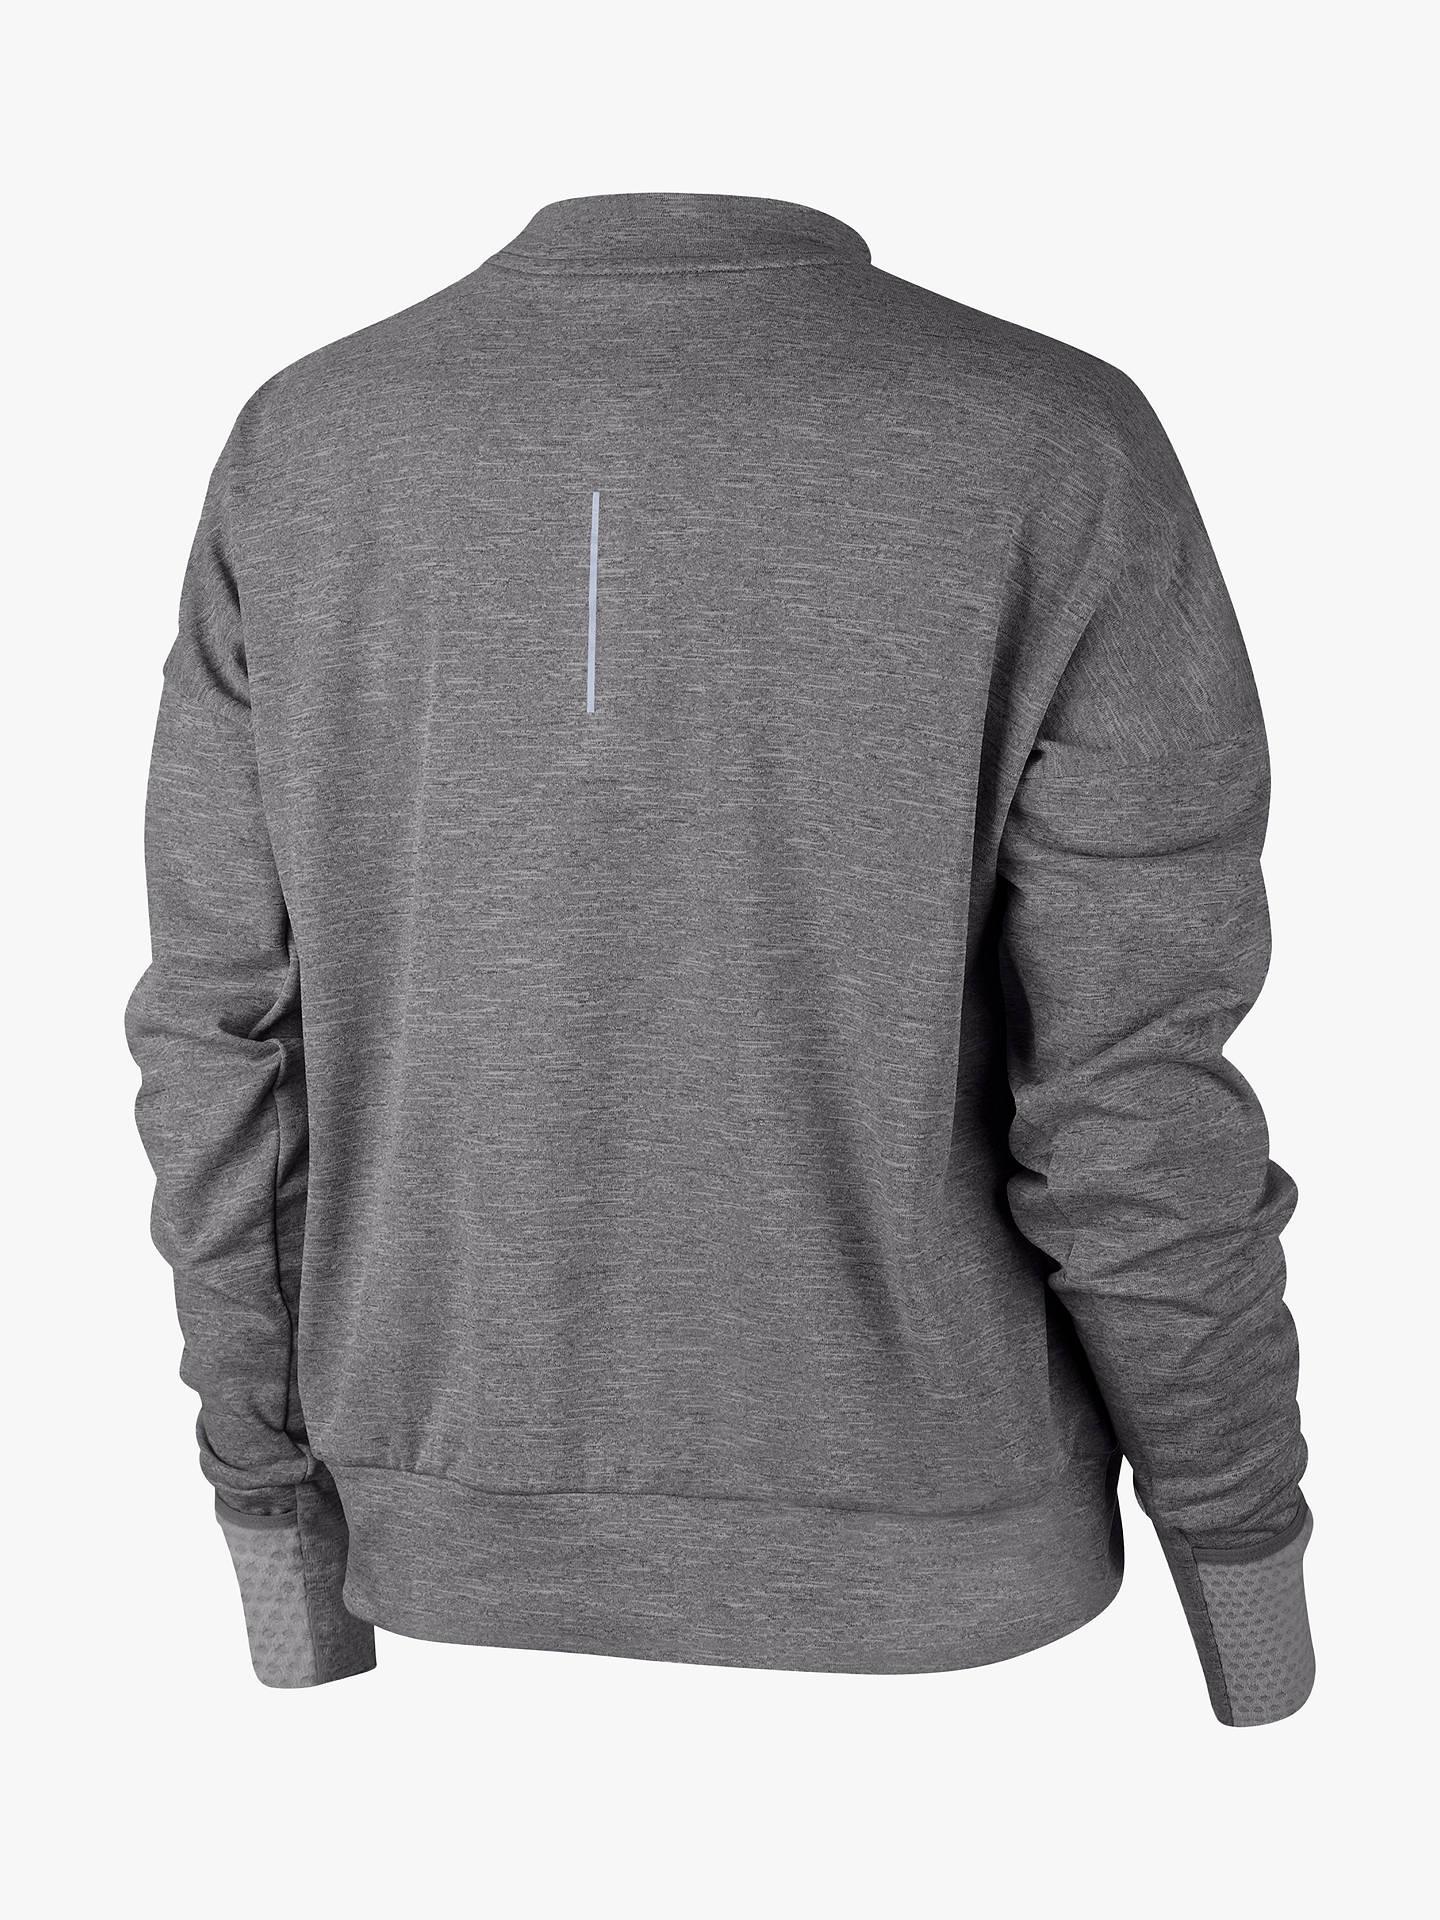 f35b530f ... Buy Nike Therma Sphere Element Running Top, Gunsmoke, S Online at  johnlewis.com